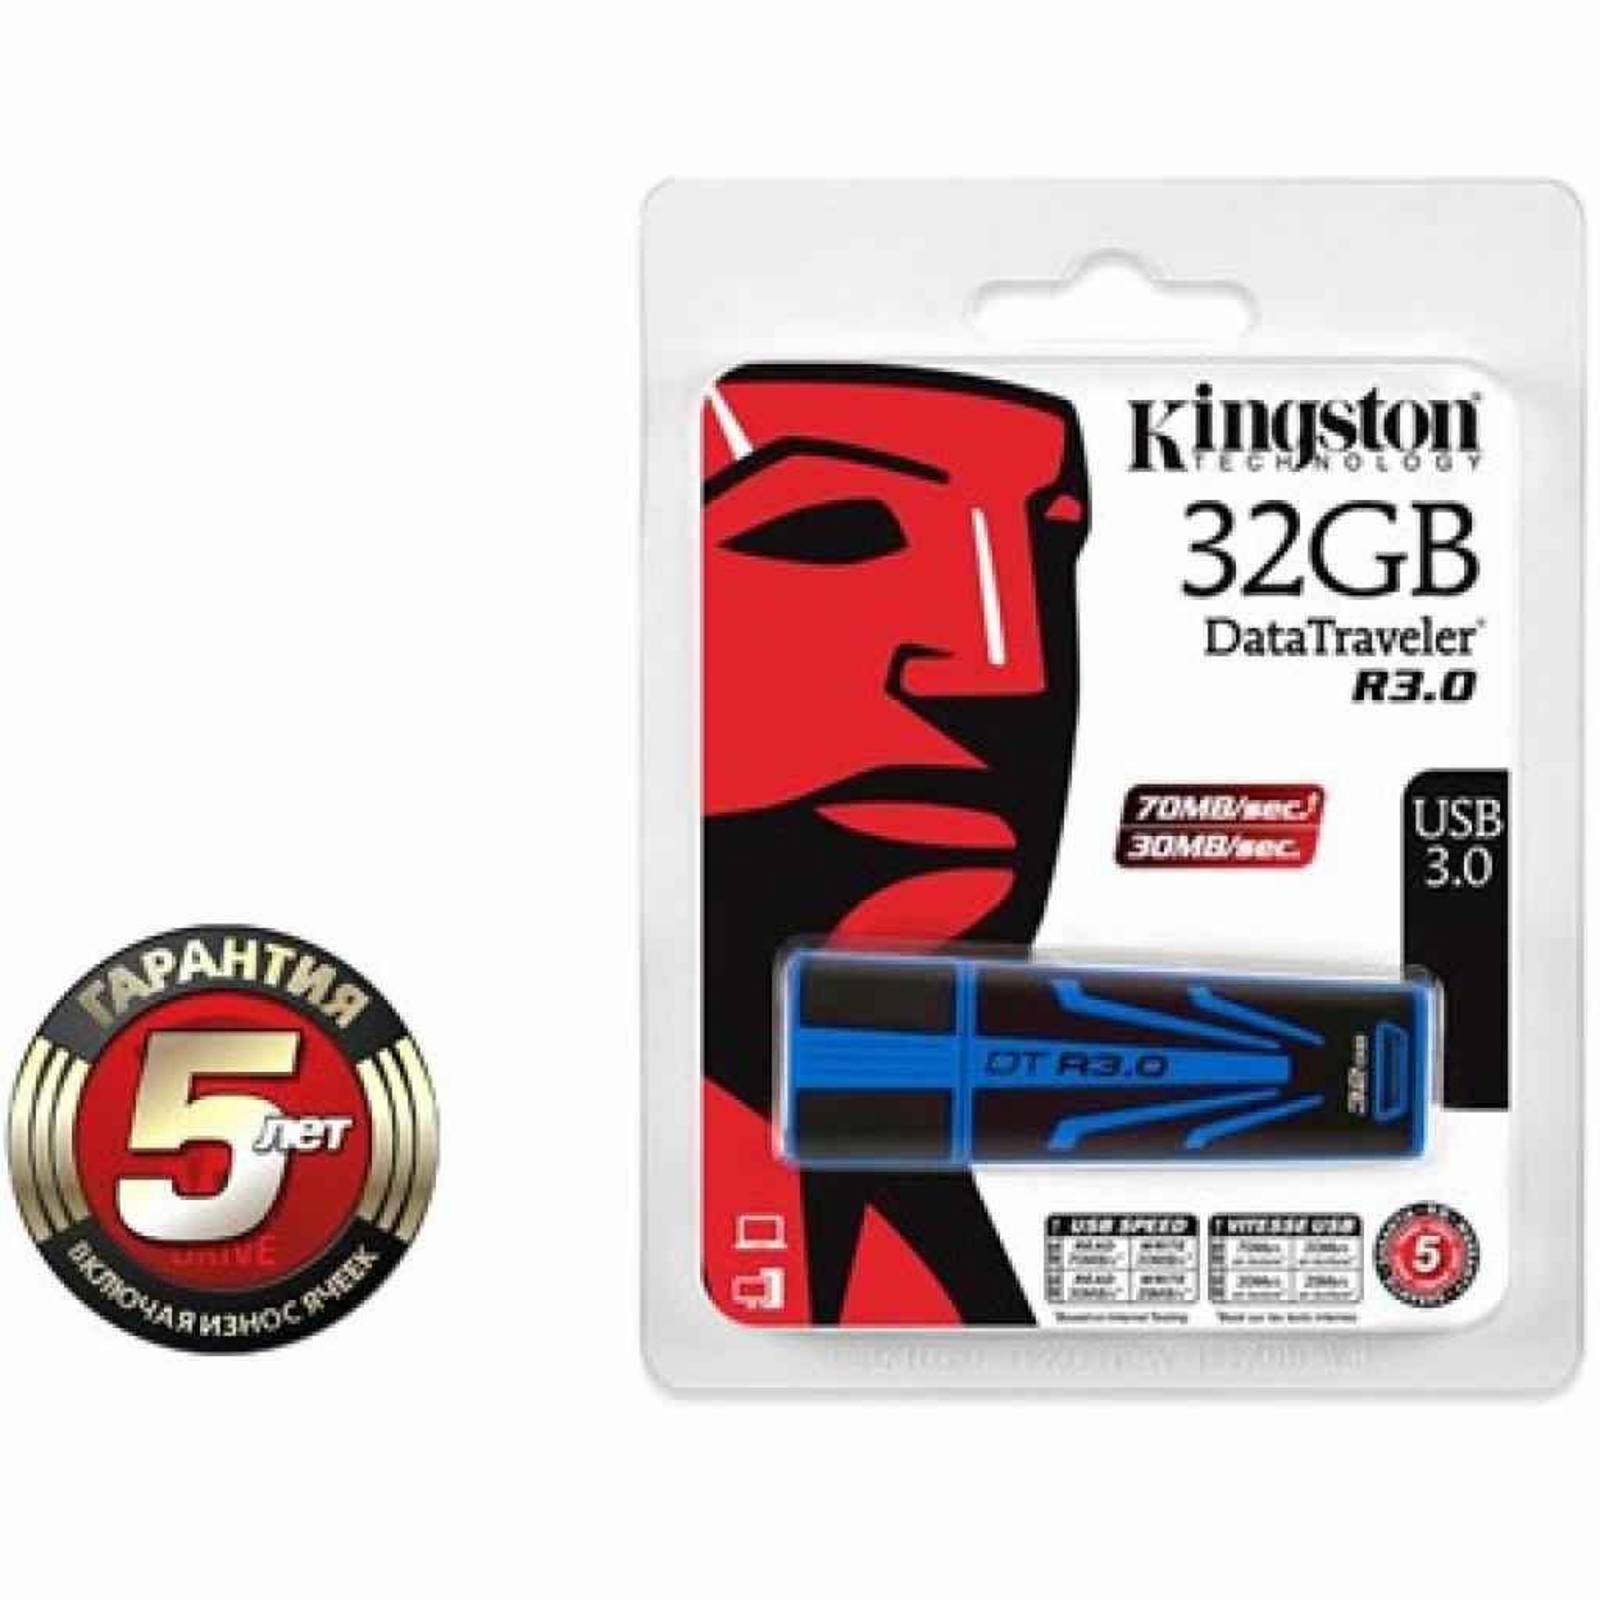 USB флеш накопитель Kingston 32Gb DataTraveler R3.0 (DTR30/32GB) изображение 3